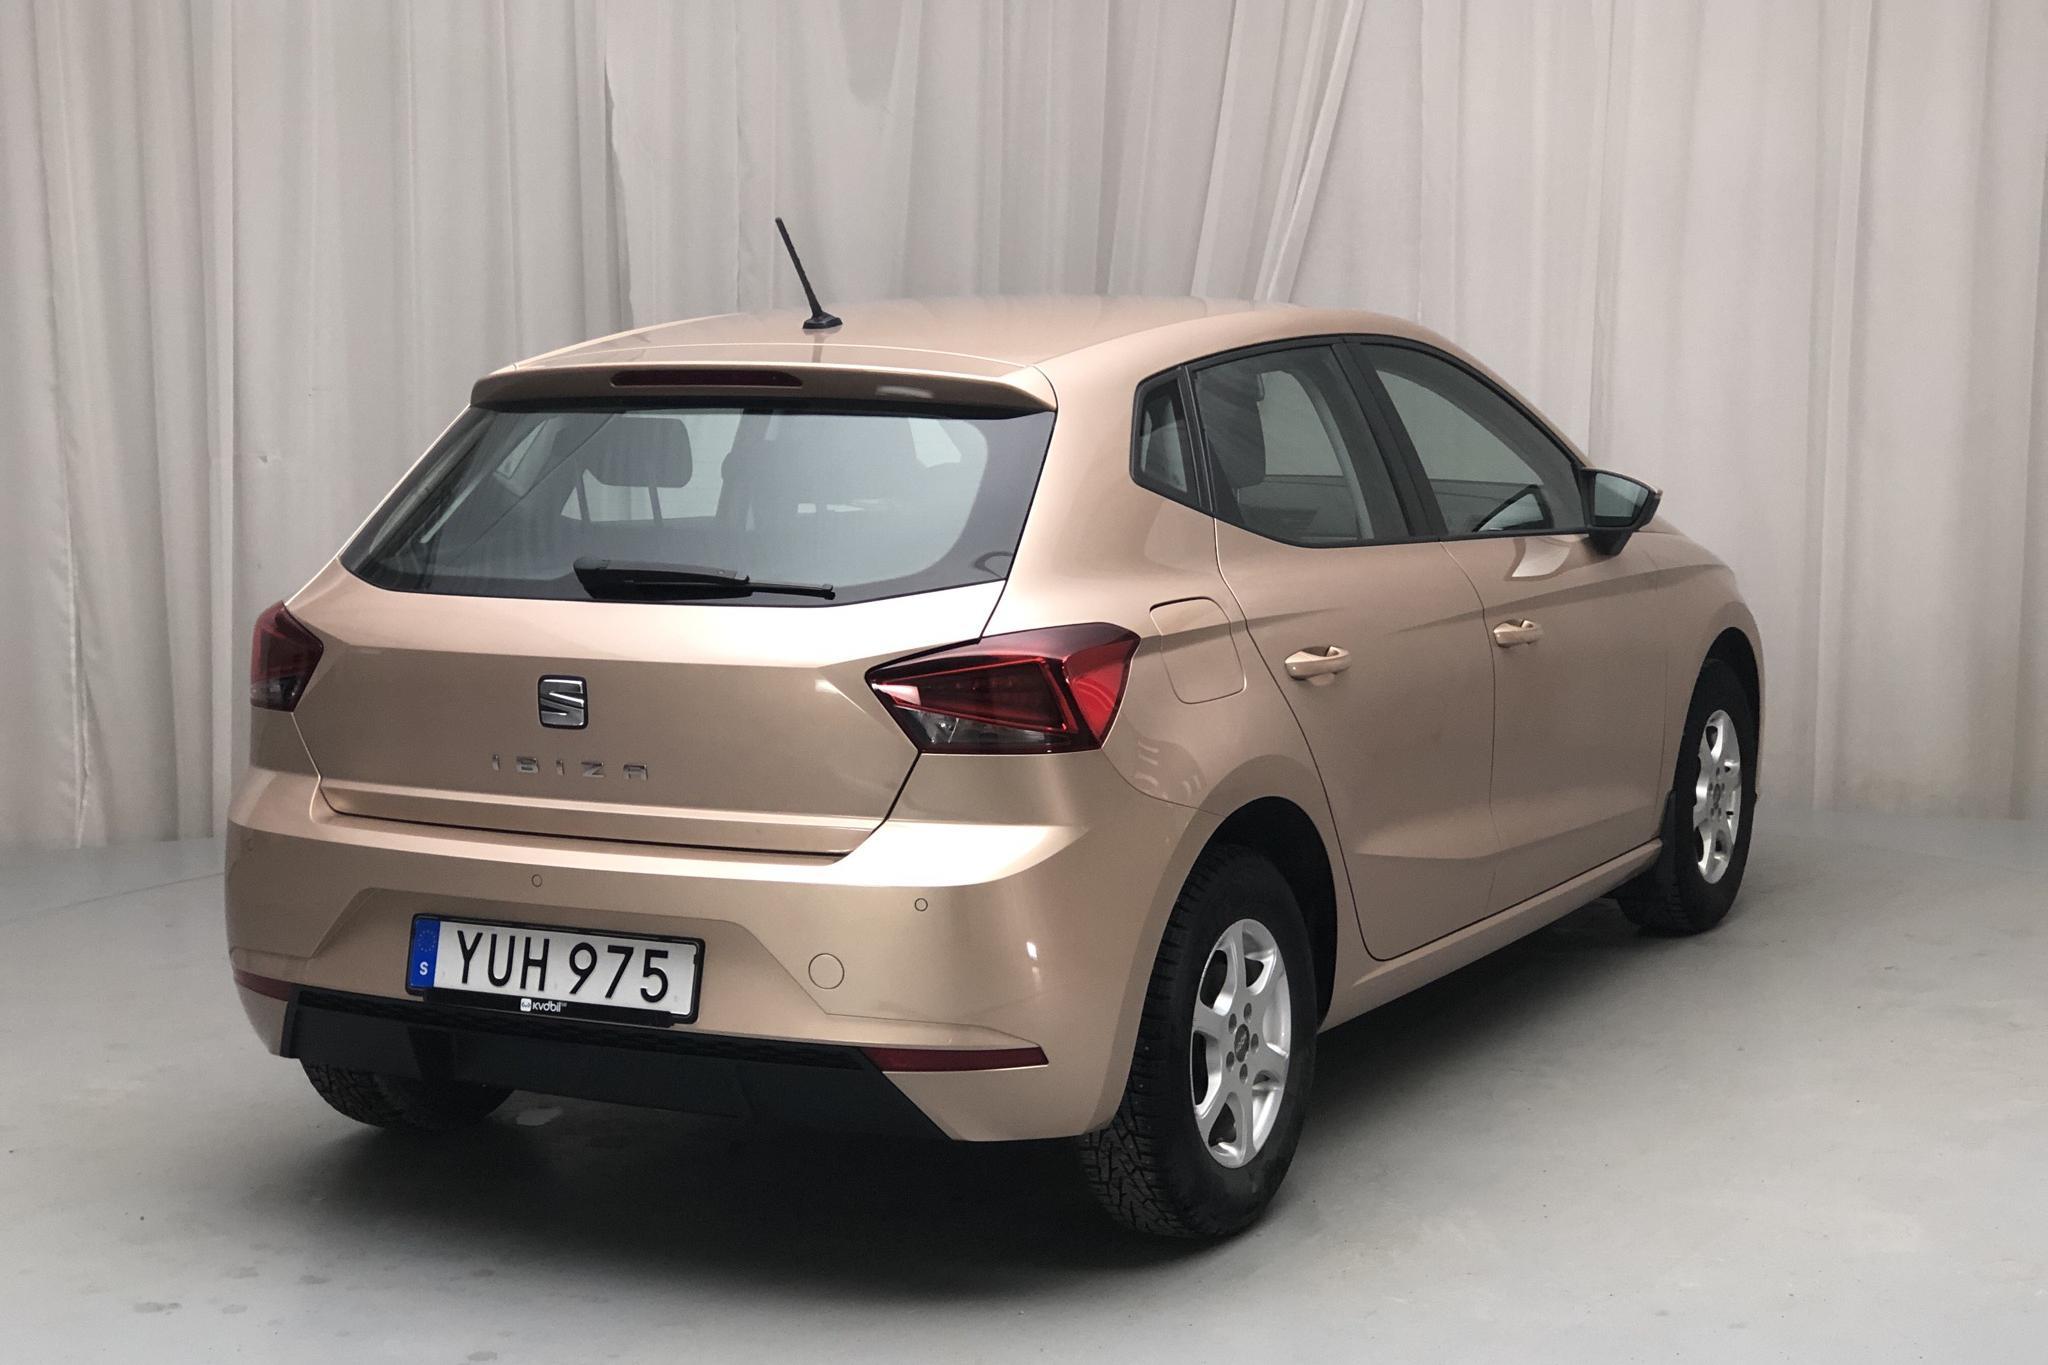 Seat Ibiza 1.0 TSI 5dr (95hk) - 3 624 mil - Manuell - 2018